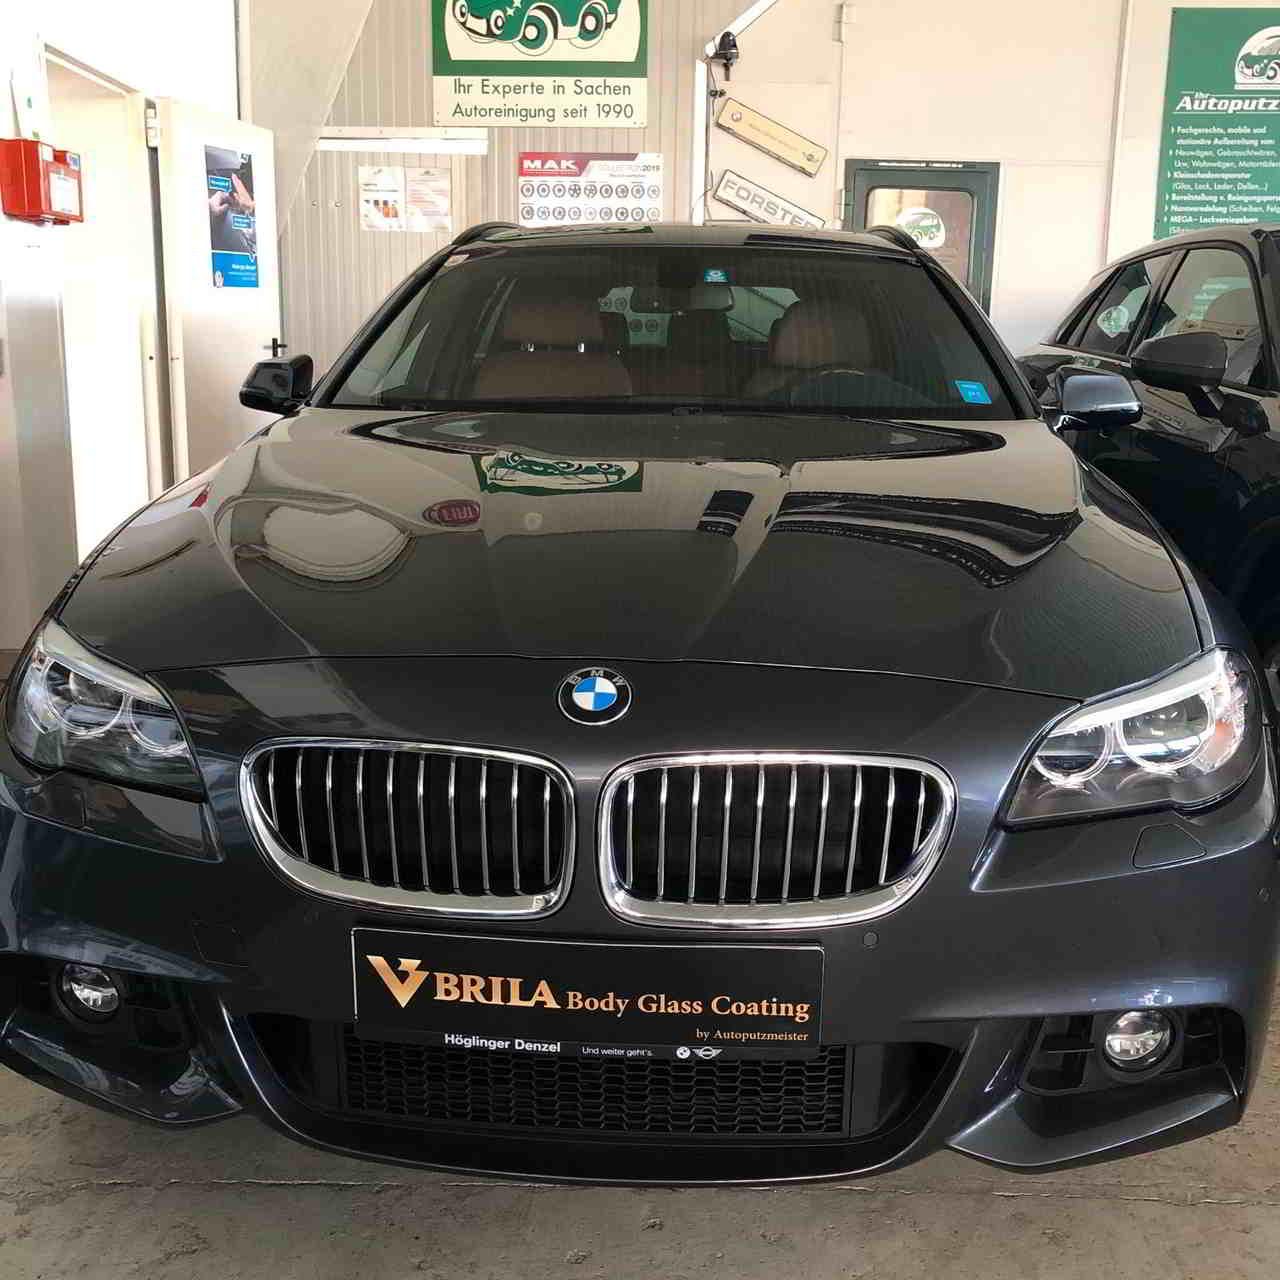 BRILA Braunau Redline Body Coating BMW Front